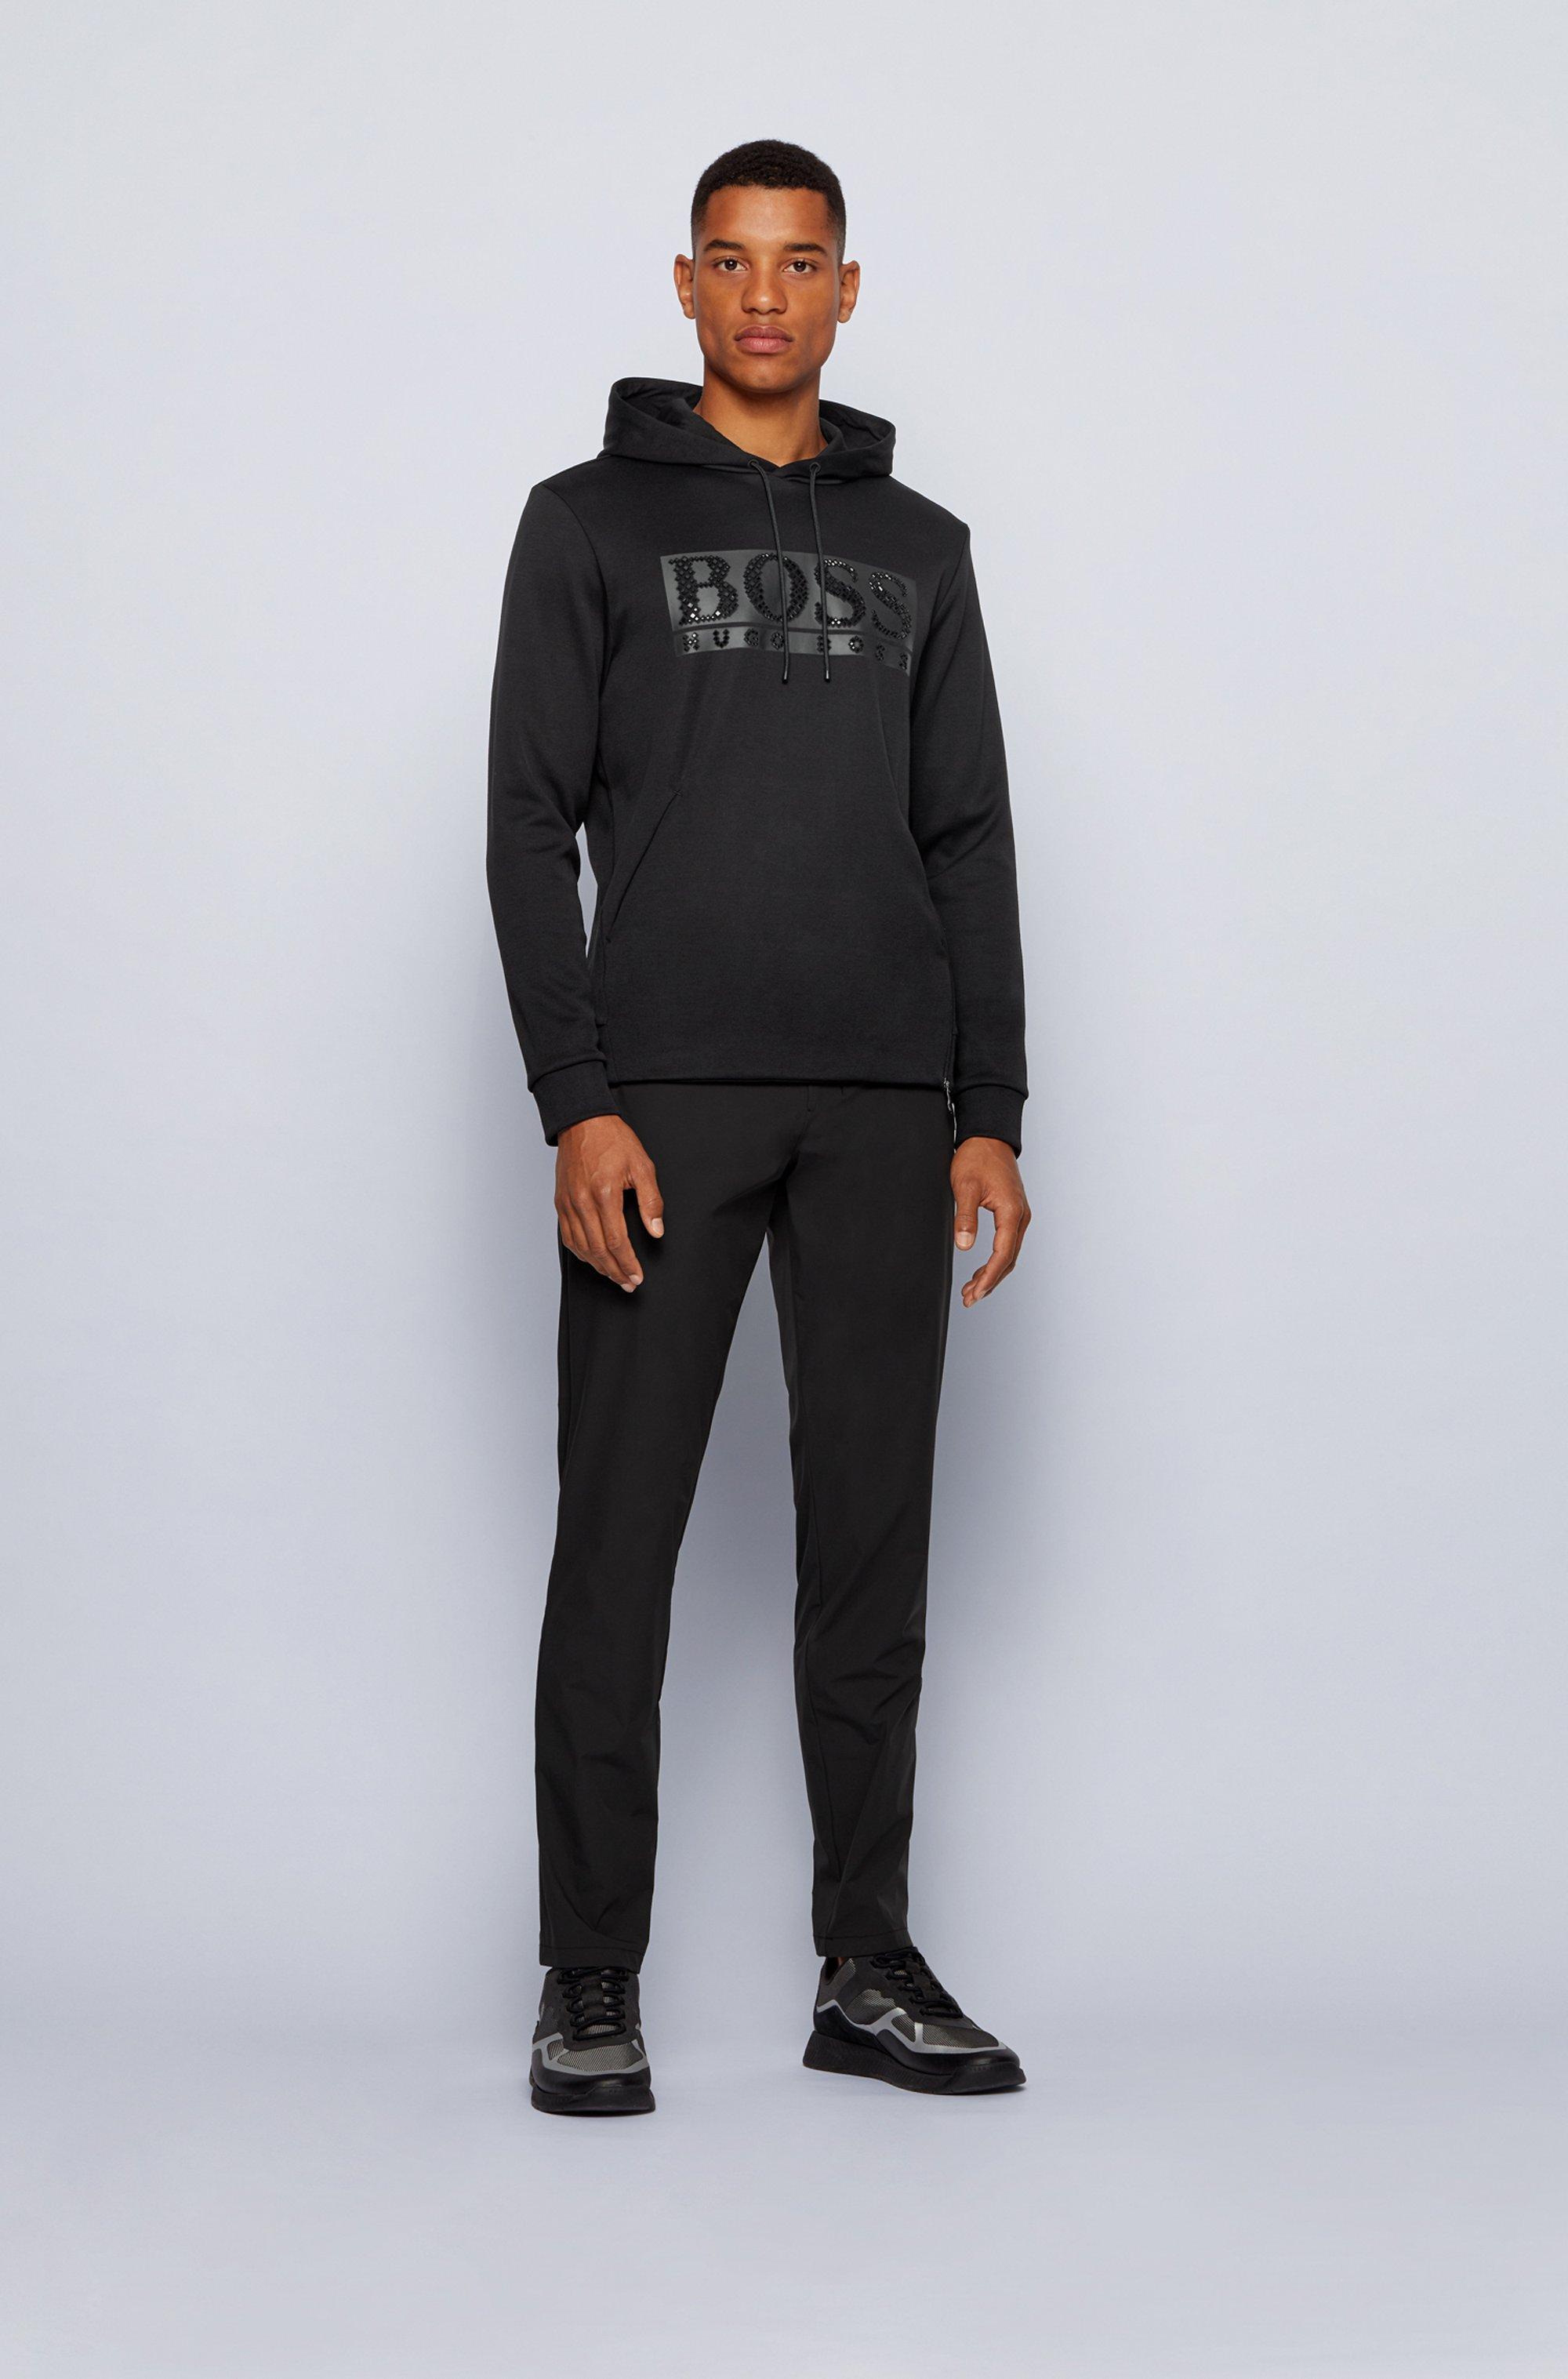 Cotton-blend hooded sweatshirt with rhinestone logo